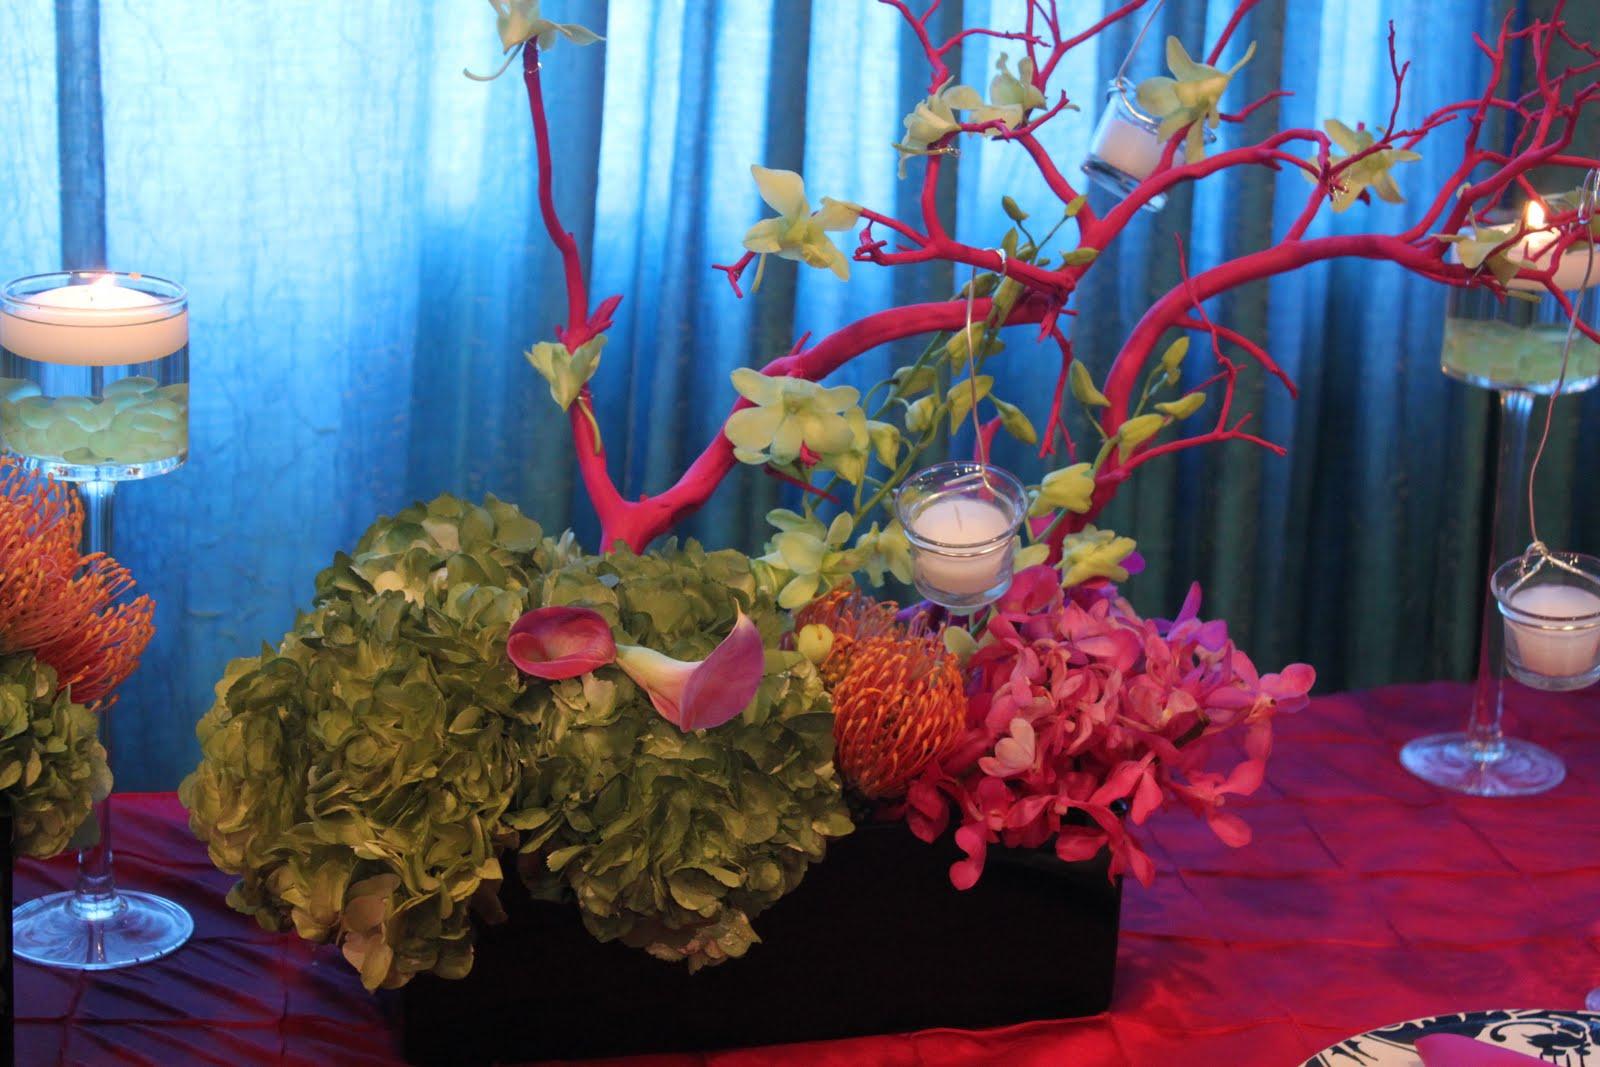 fairytale wedding centerpieces